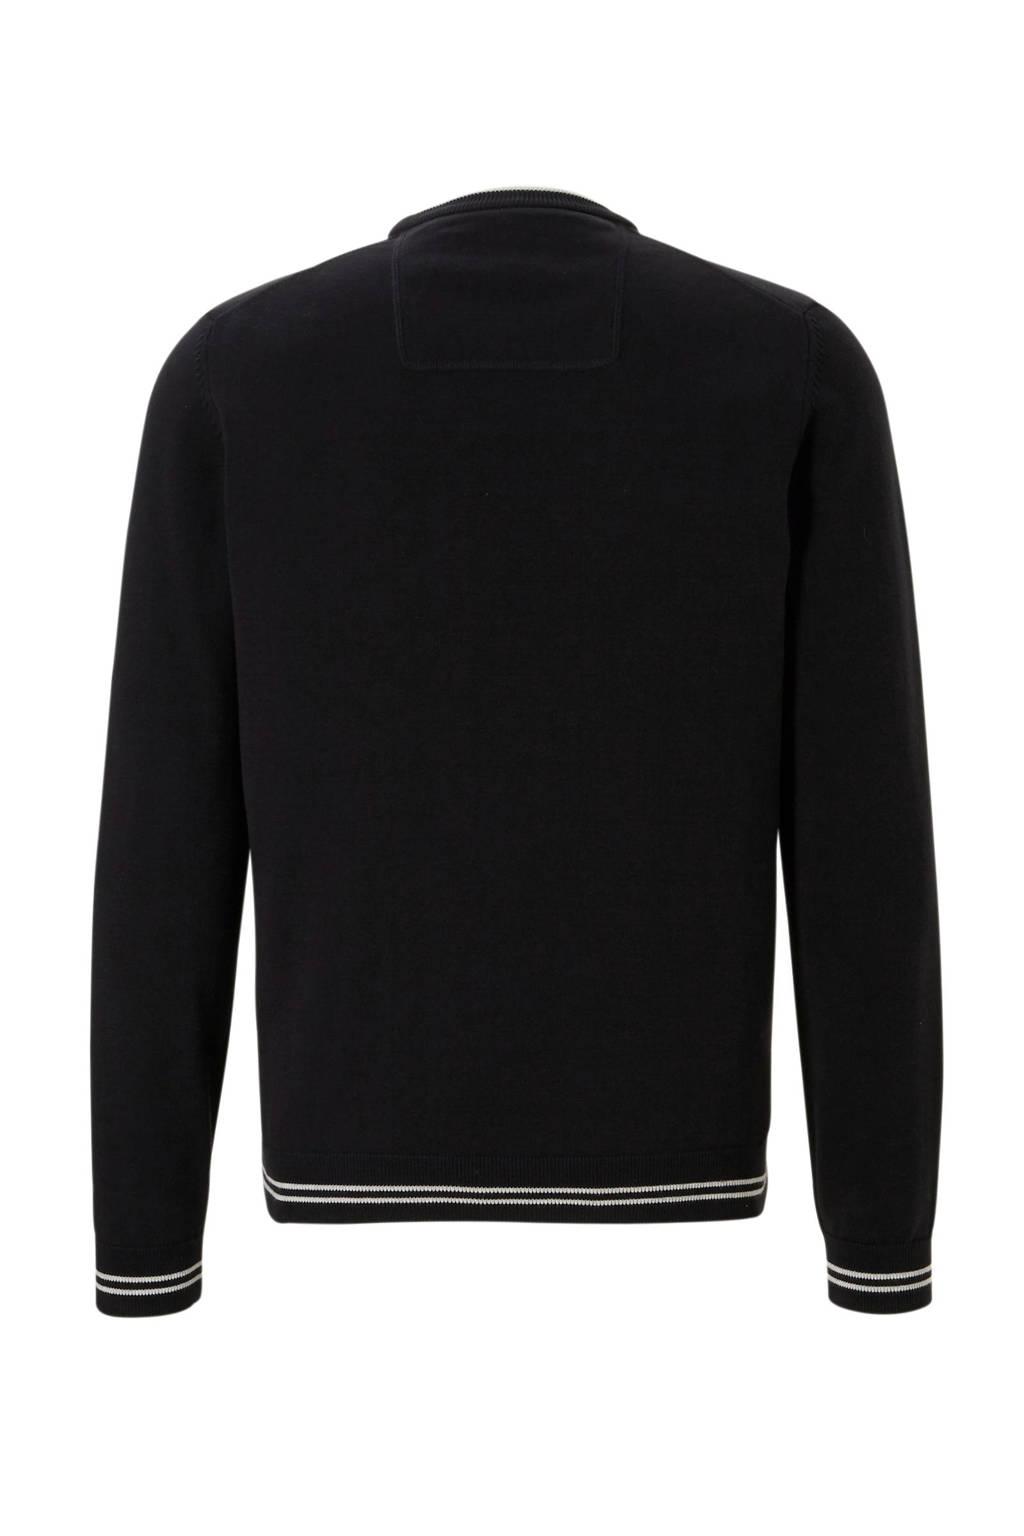 Boss Athleisure trui, Zwart